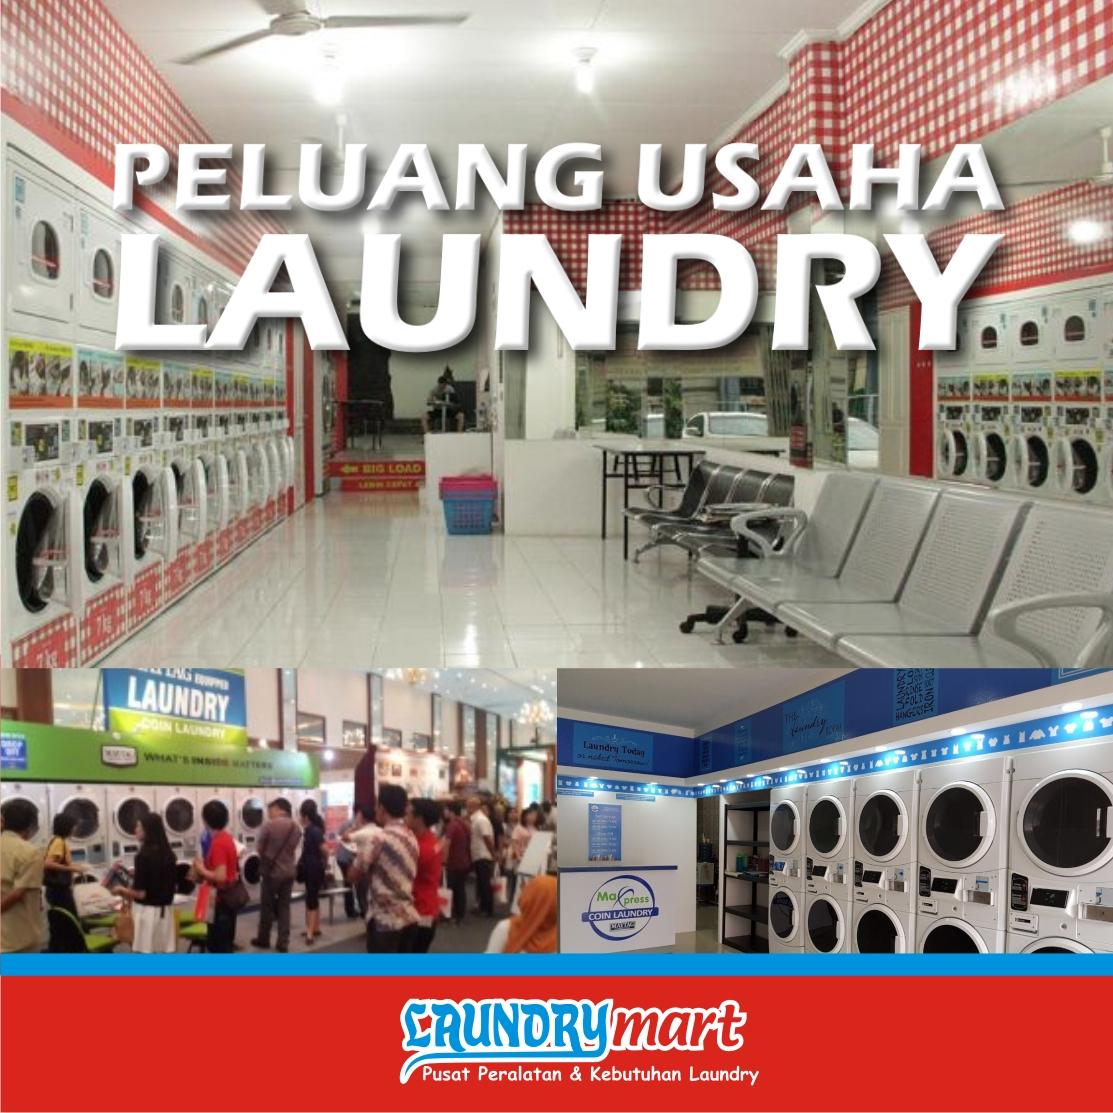 paket usaha laundry - Peluang Usaha Laundry - bisnis ...